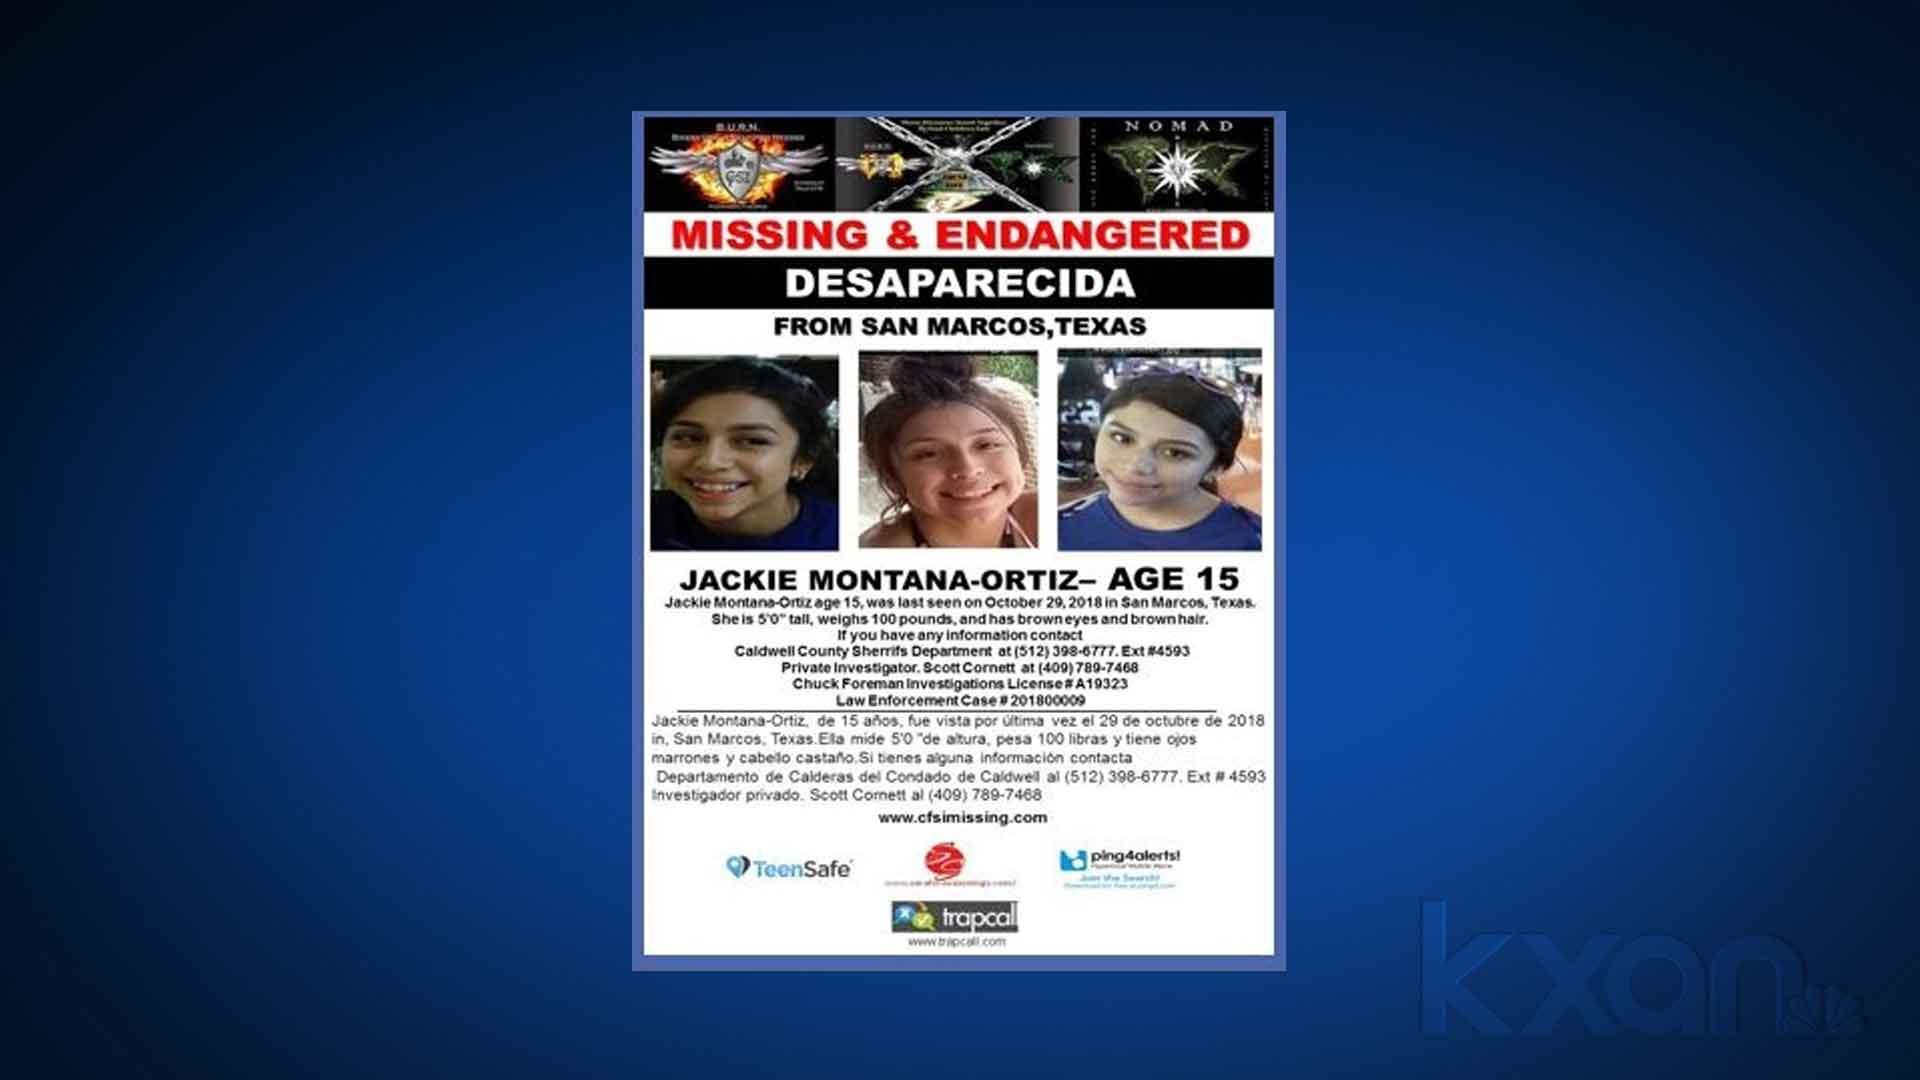 Missing Jacki Montana-Ortiz